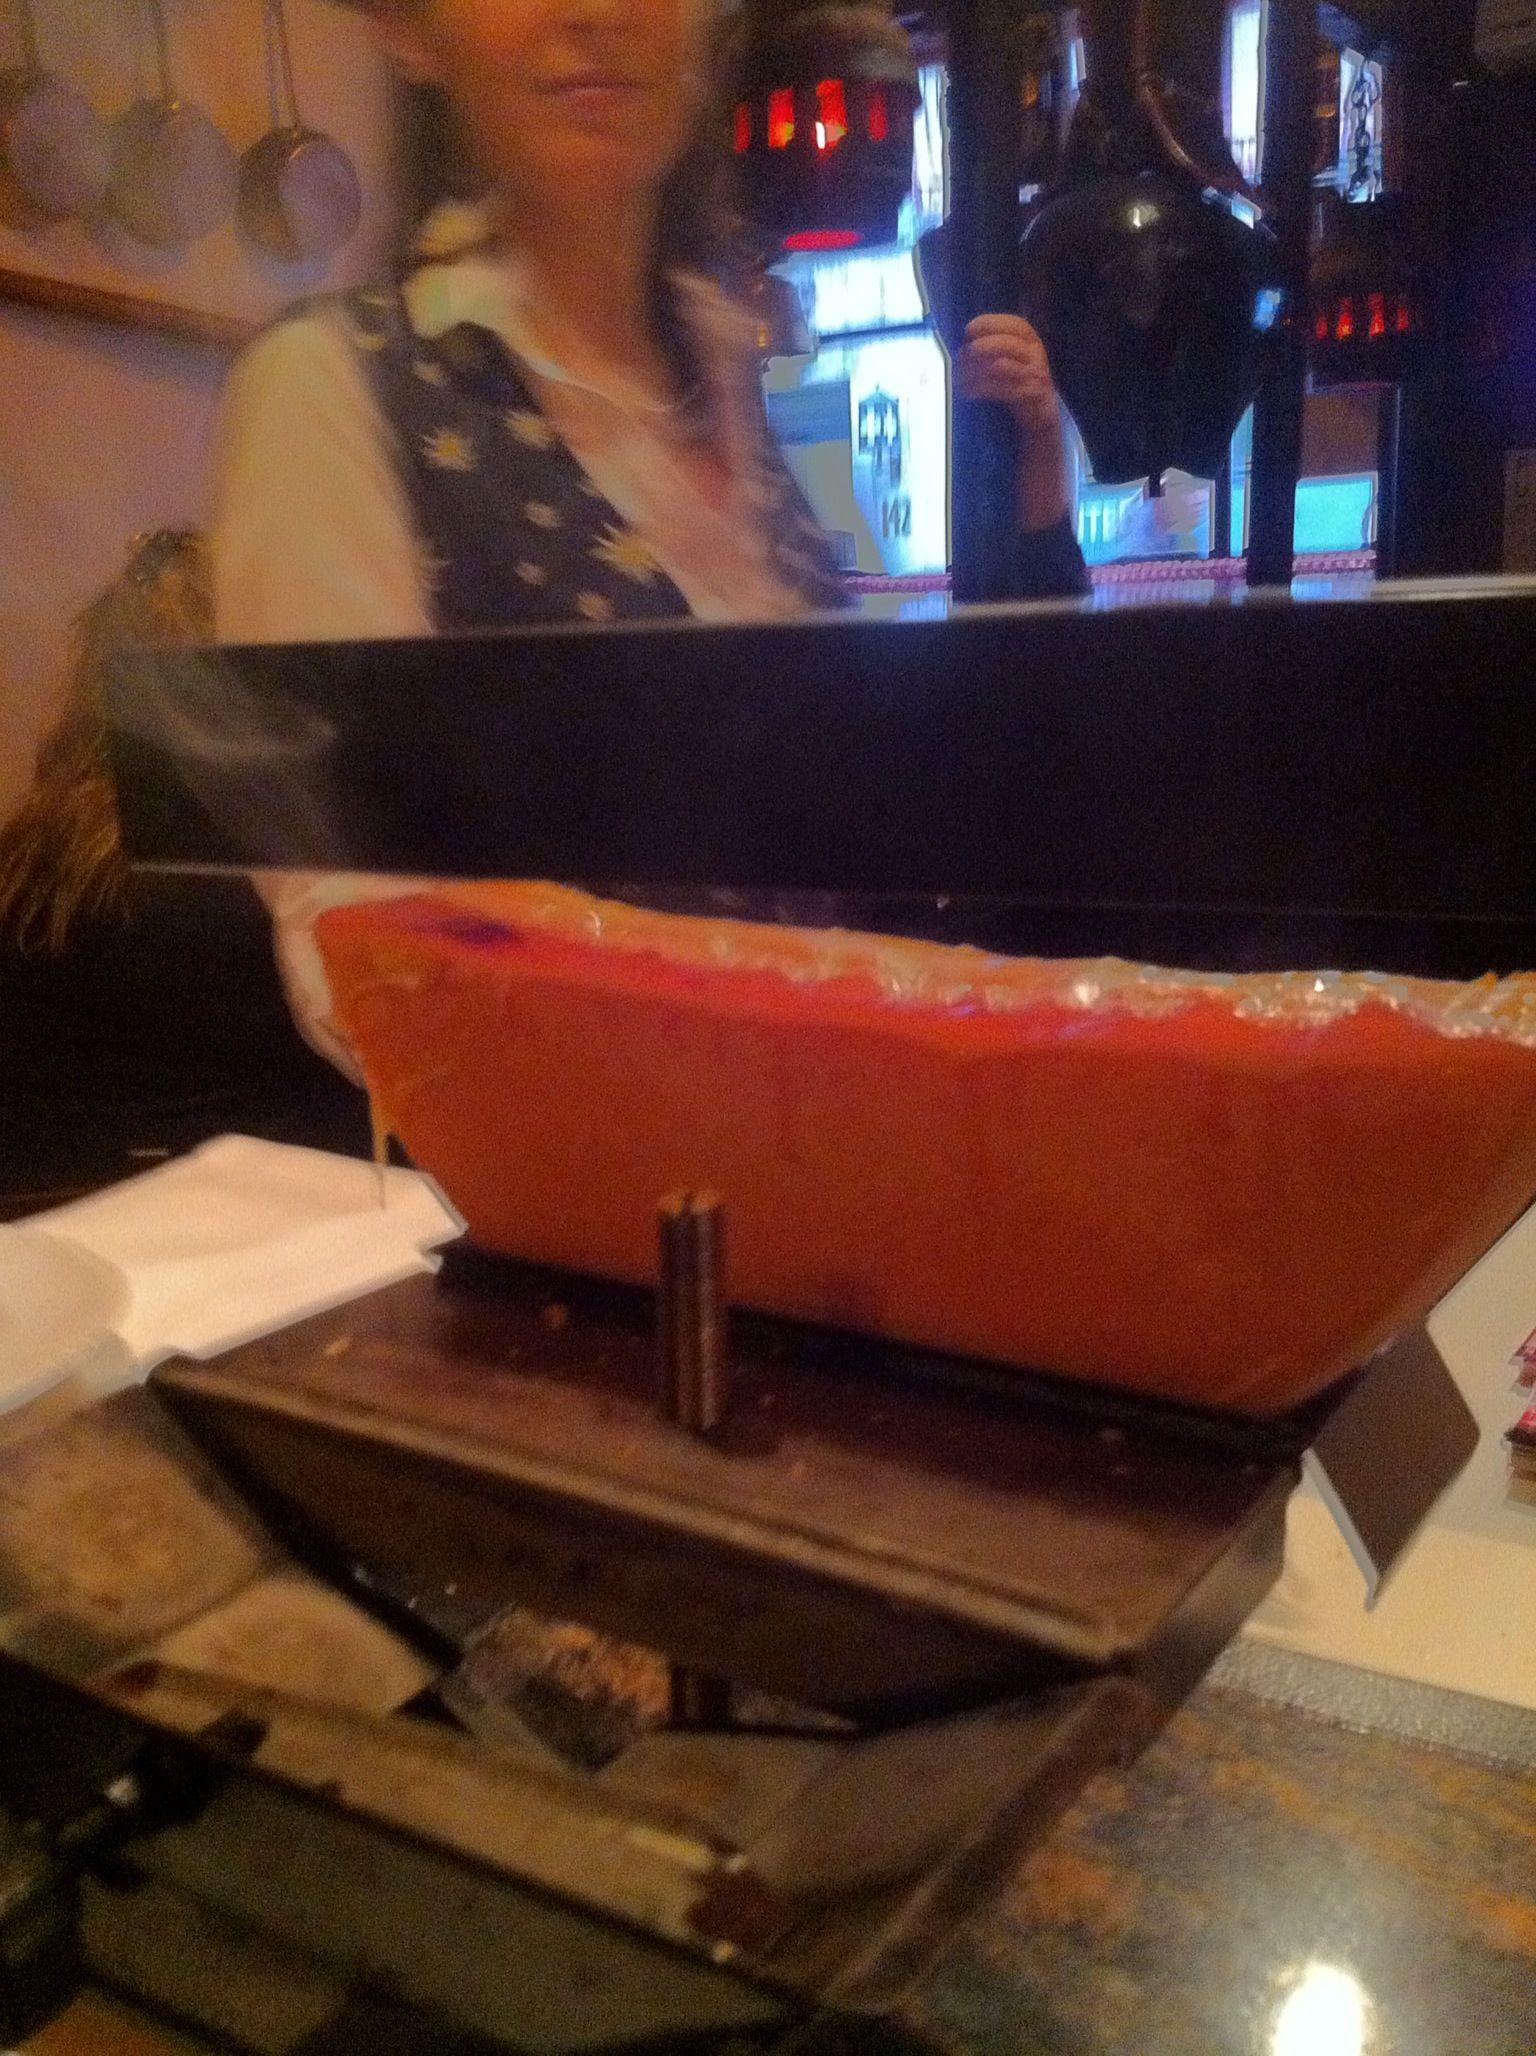 Queso raclette fundido, típico de Suiza